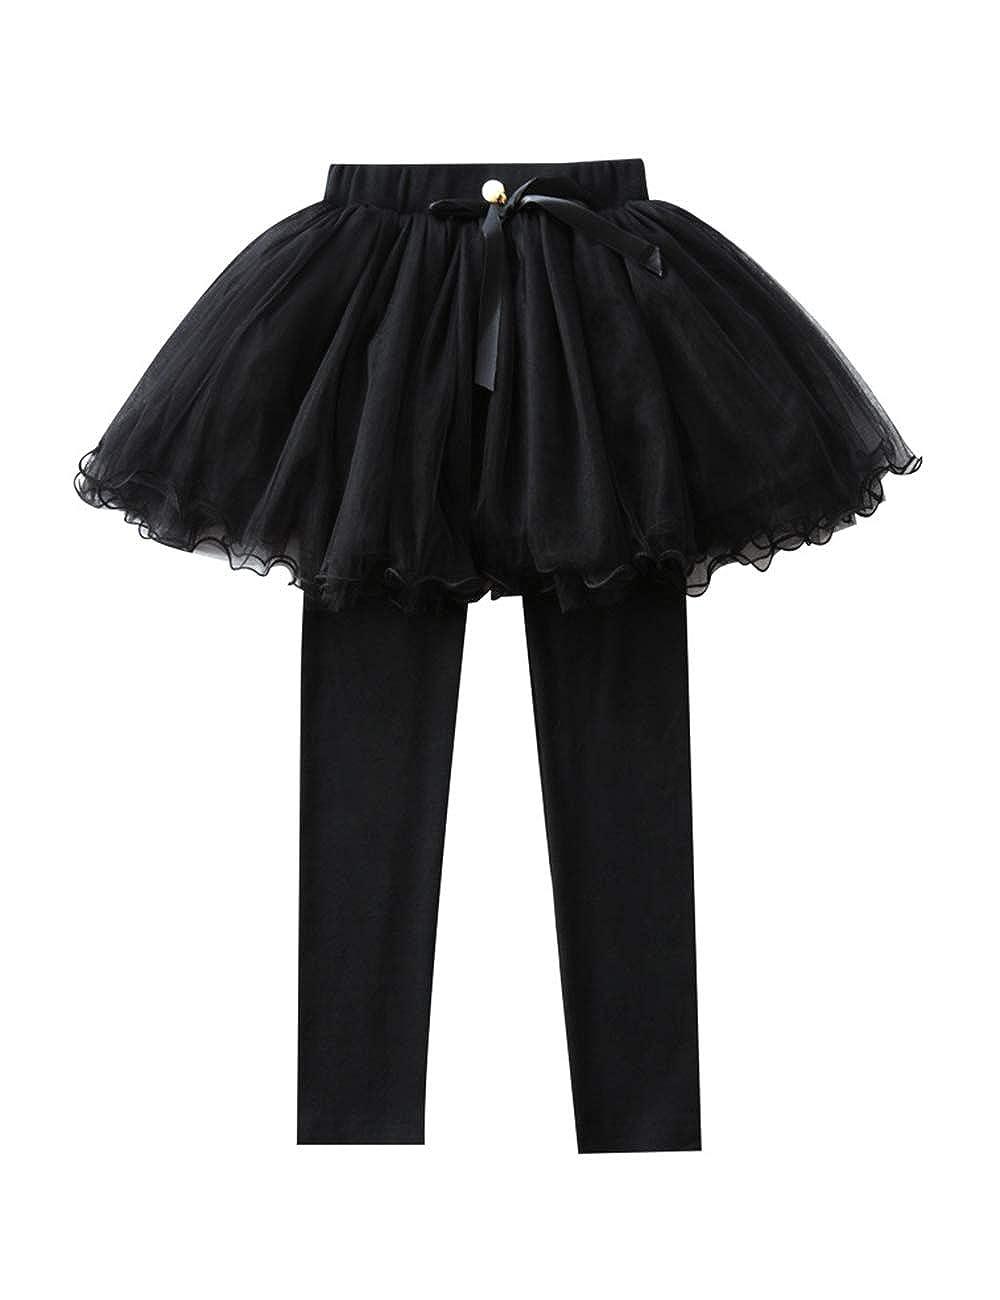 Zhhlinyuan Girls Leggings and Skirt Set Age 7 8 9 10 11 Years Elastic Fabric